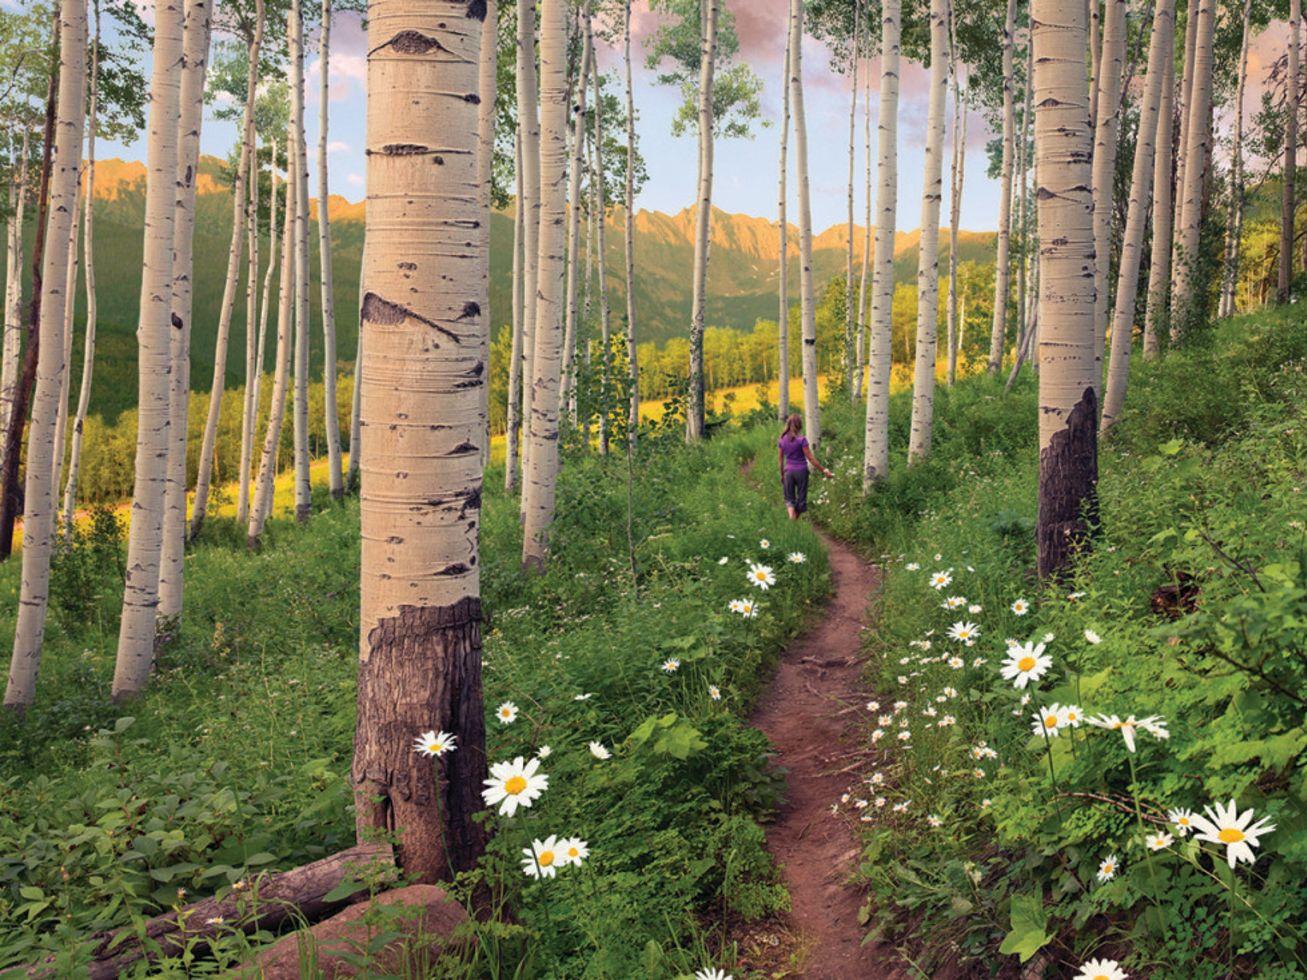 Berry picker trail vail coloradoaffleck cdhb1m